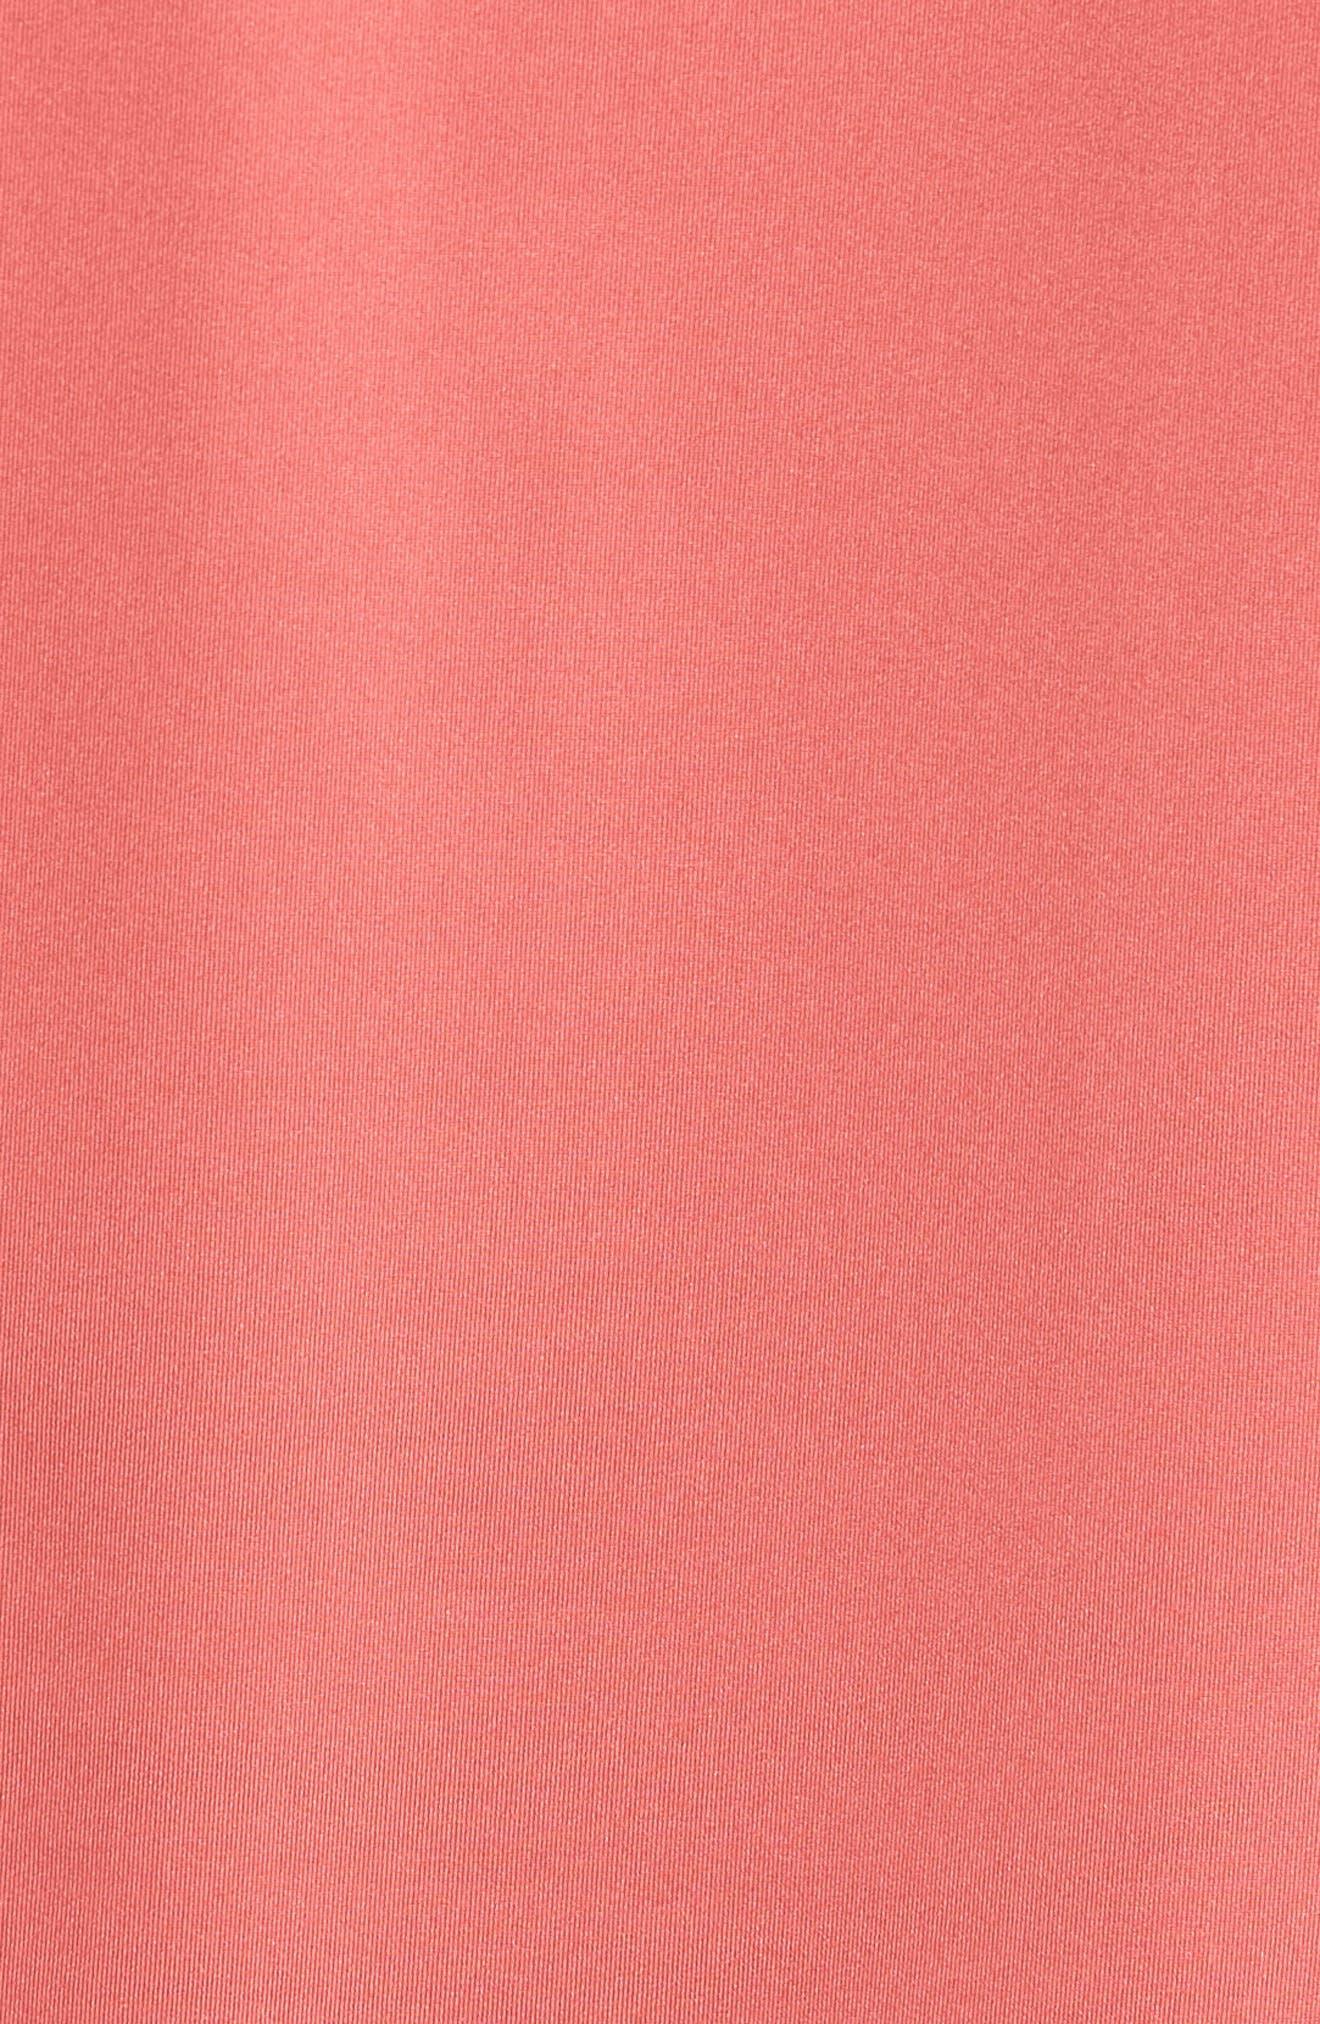 Alternate Image 5  - Peter Millar Sean Stretch Jersey Polo